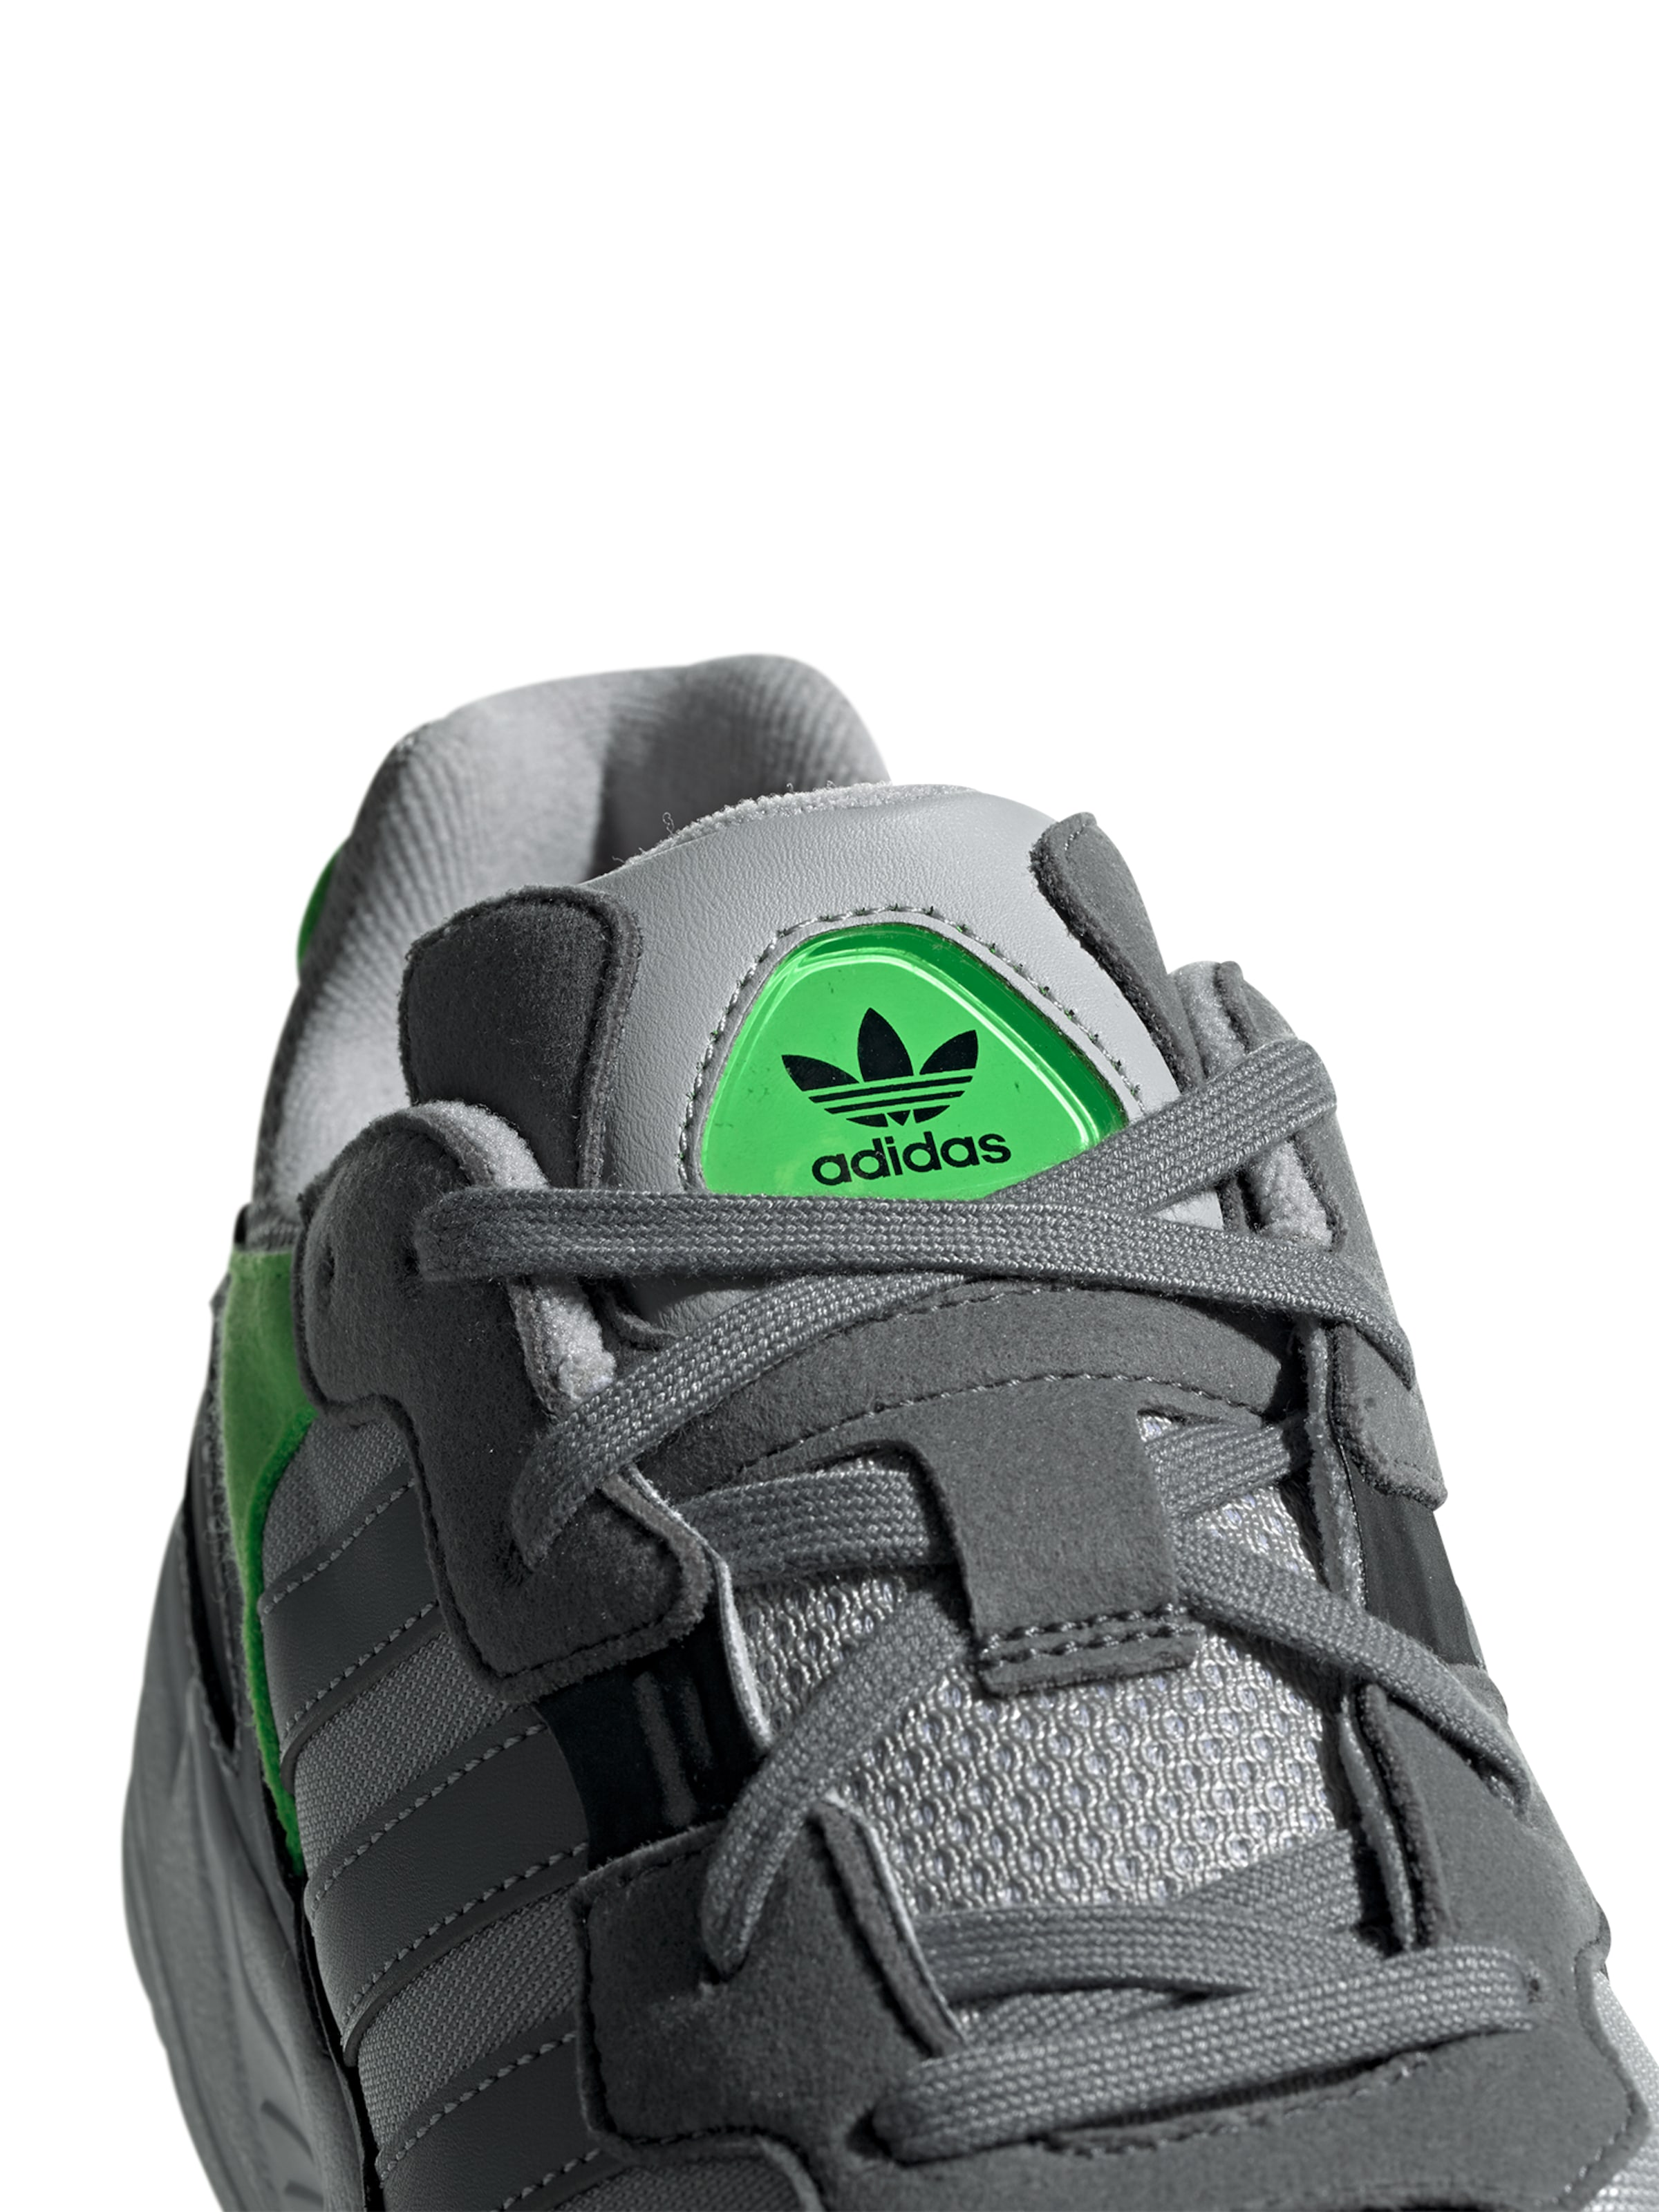 96' GrauDunkelgrau Originals Sneaker 'yung Kiwi Adidas In f6byYgv7